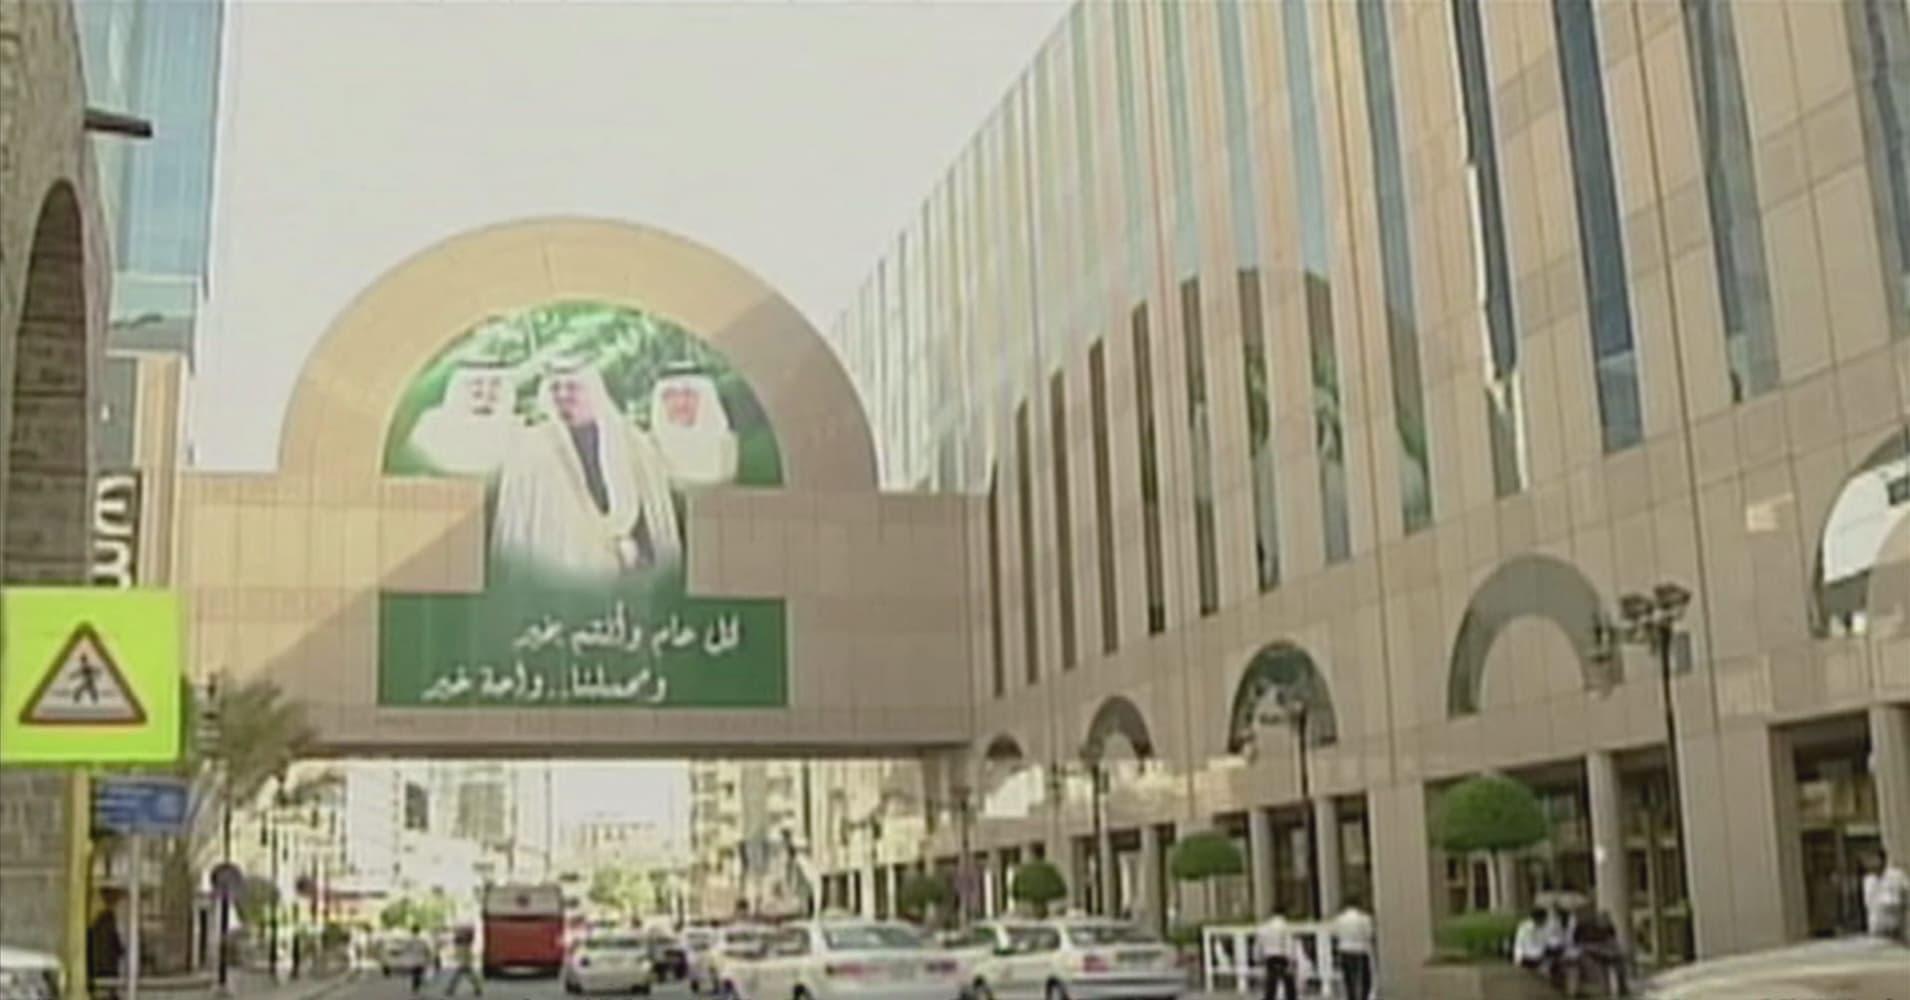 Why Saudi Arabia is mad at Qatar and why we care